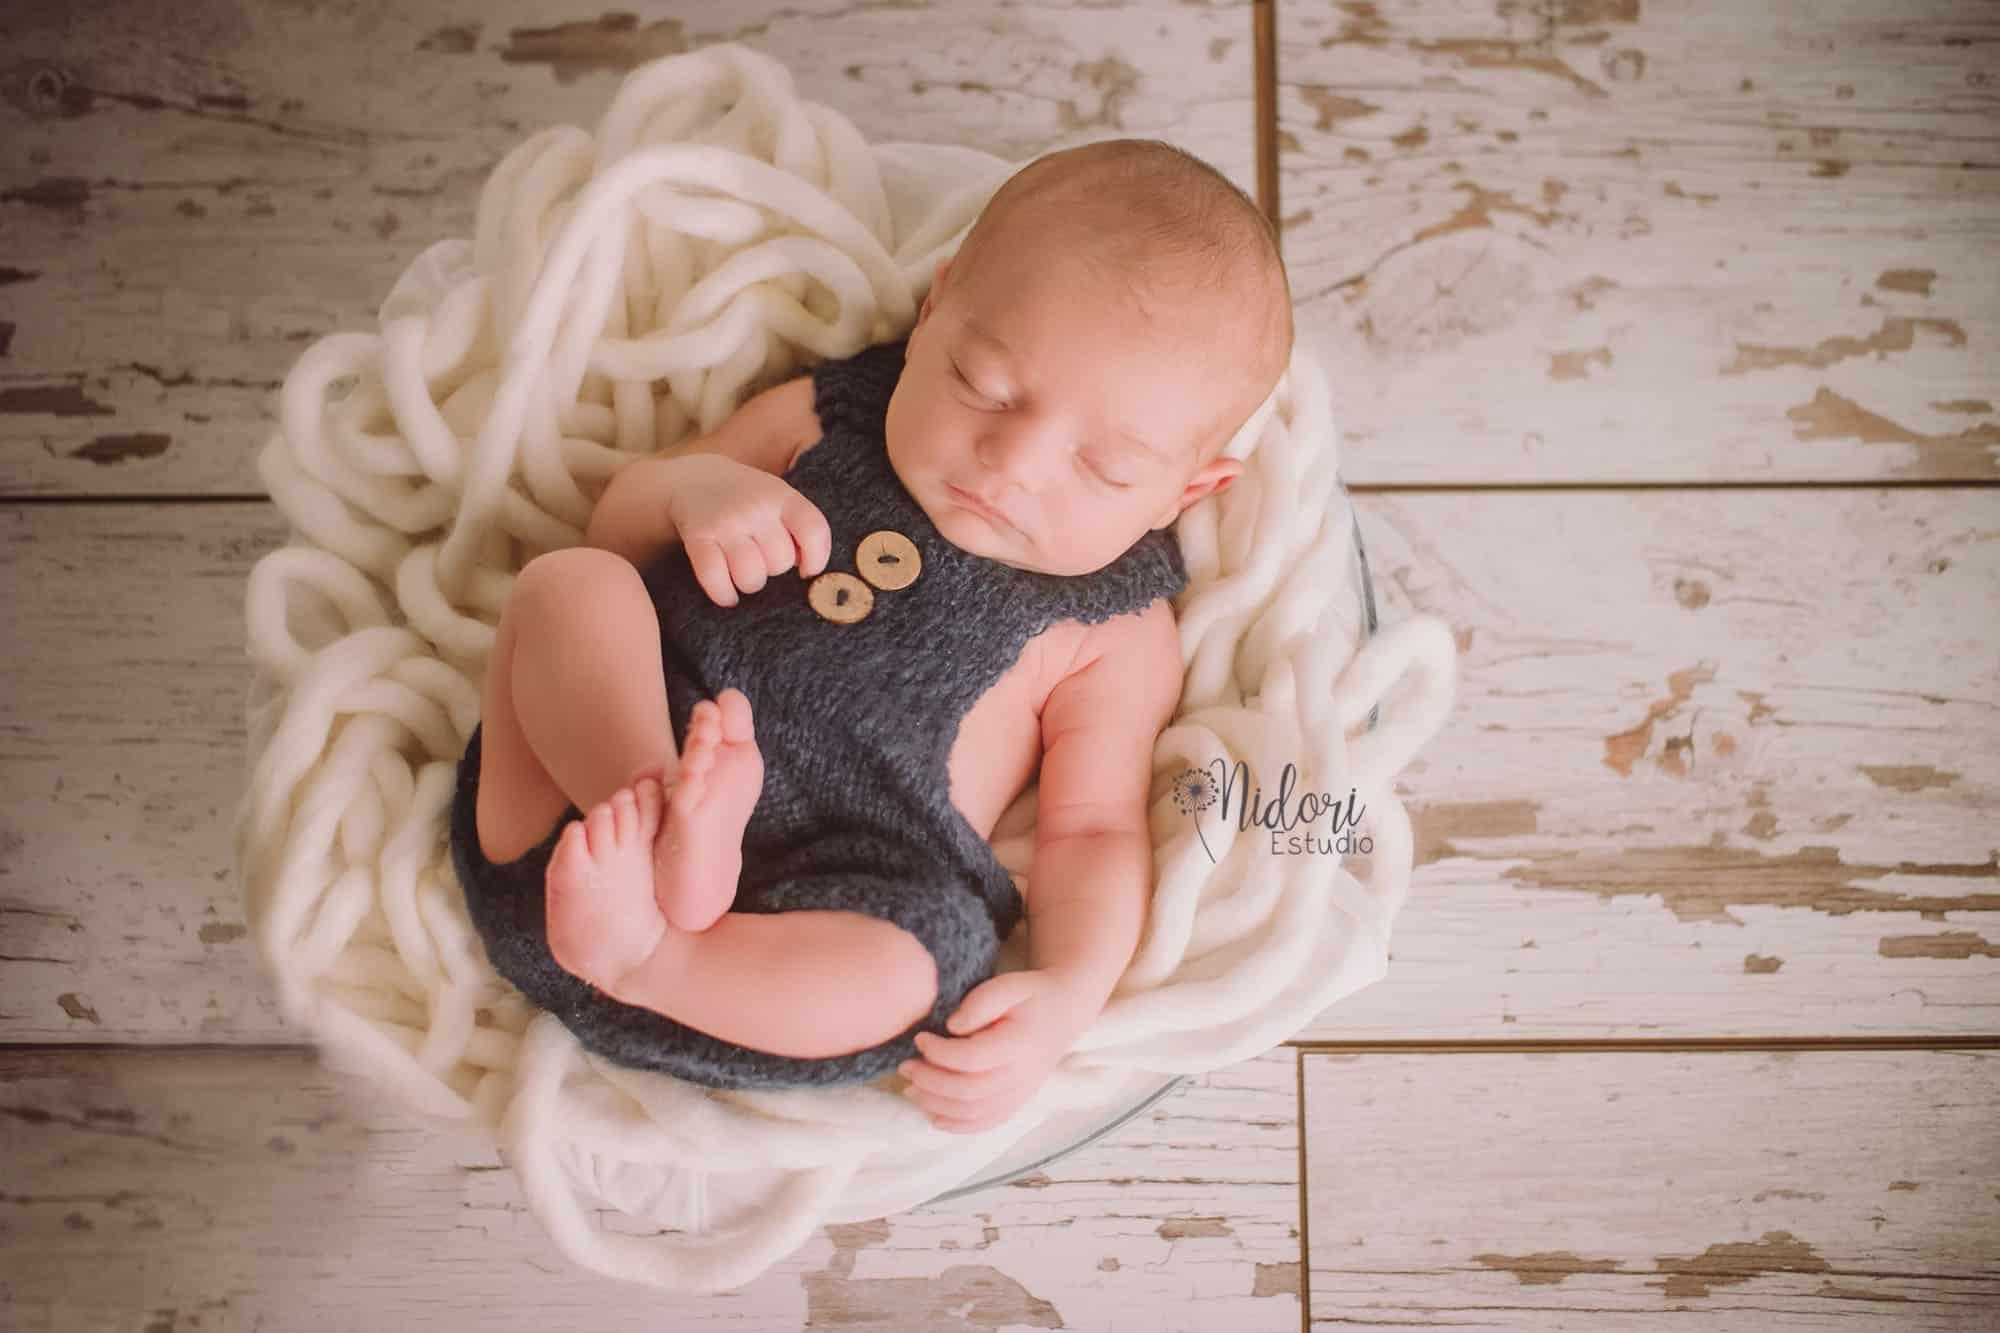 seguimiento-fotografia-niños-bebes-nidoriestudio-fotos-valencia-almazora-castellon-españa-spain-23